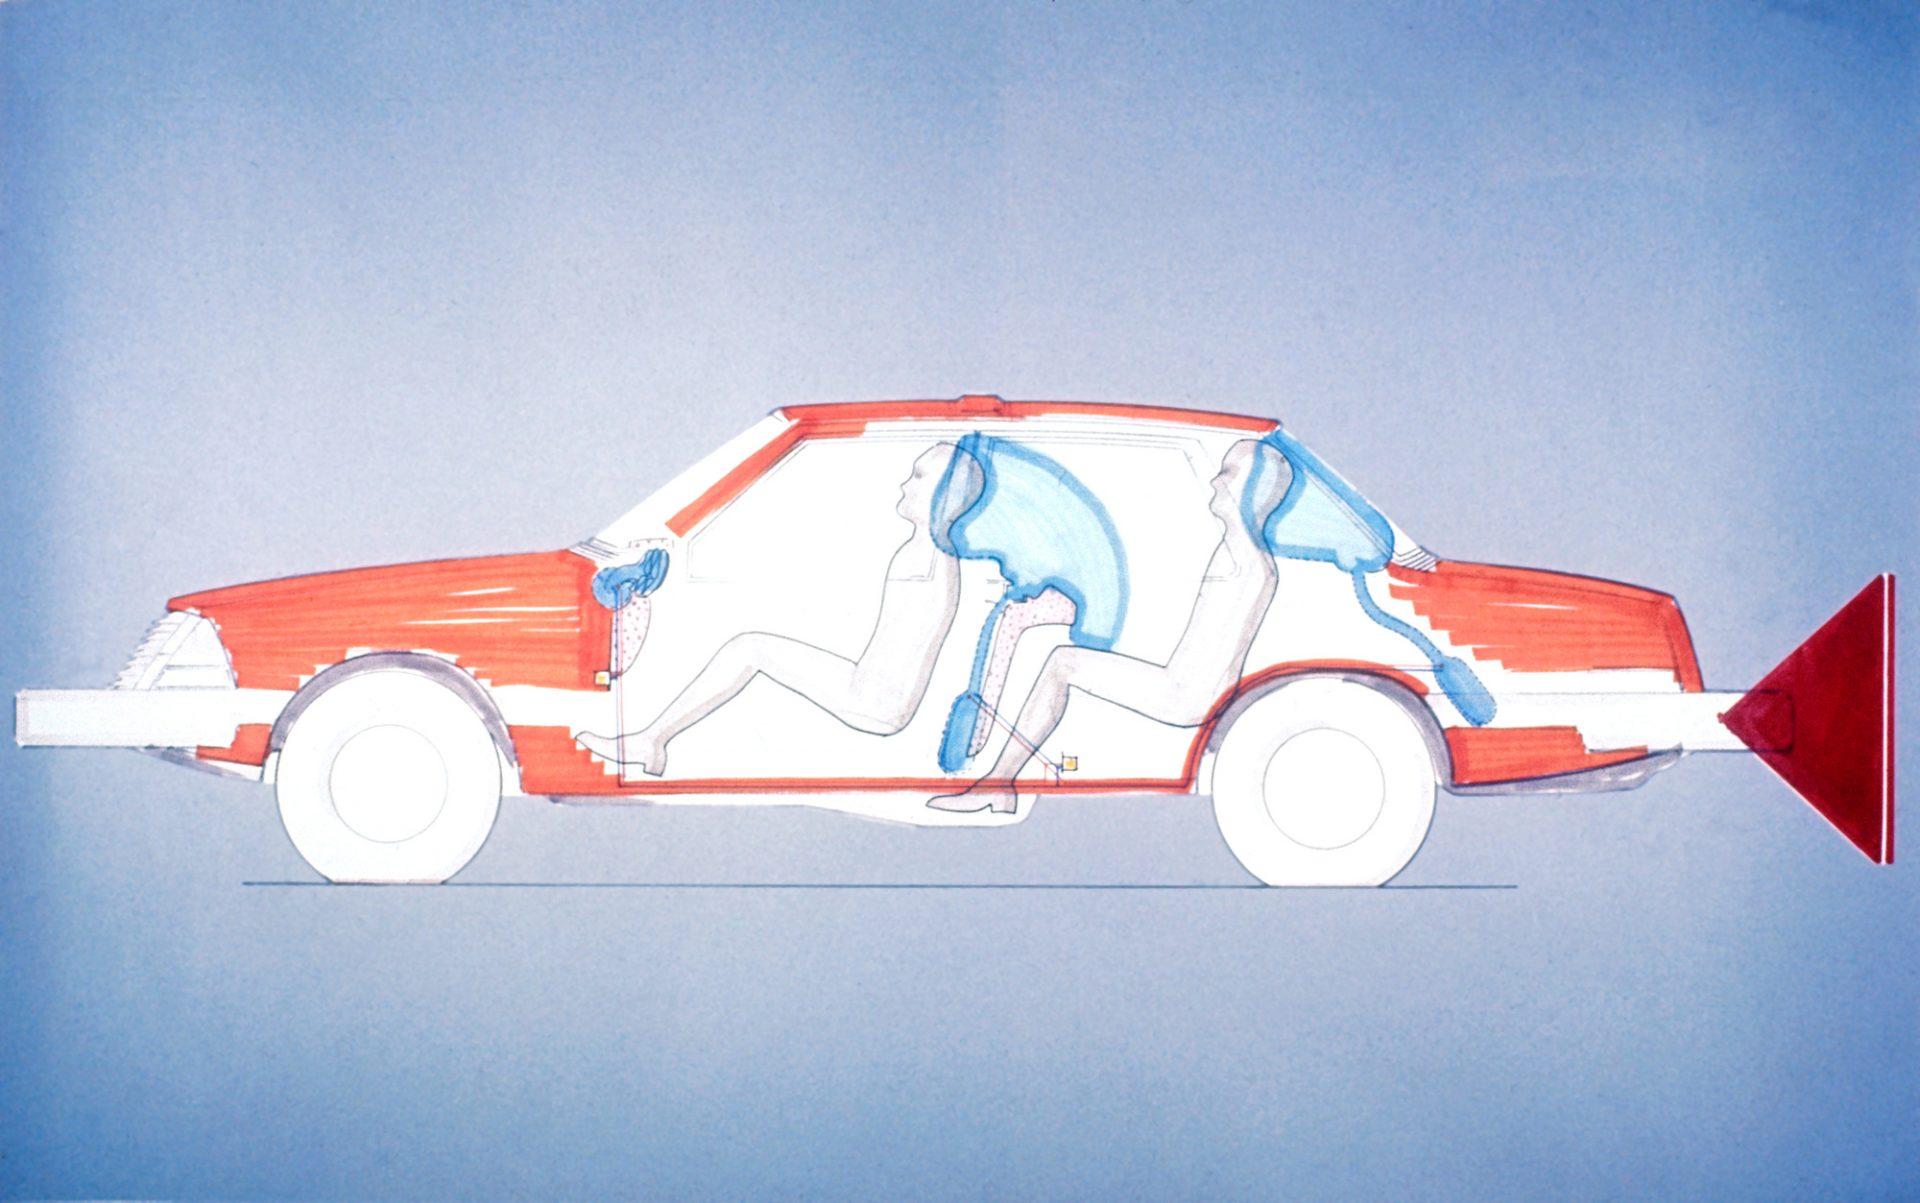 Volvo_VESC_Concept_Car_20555